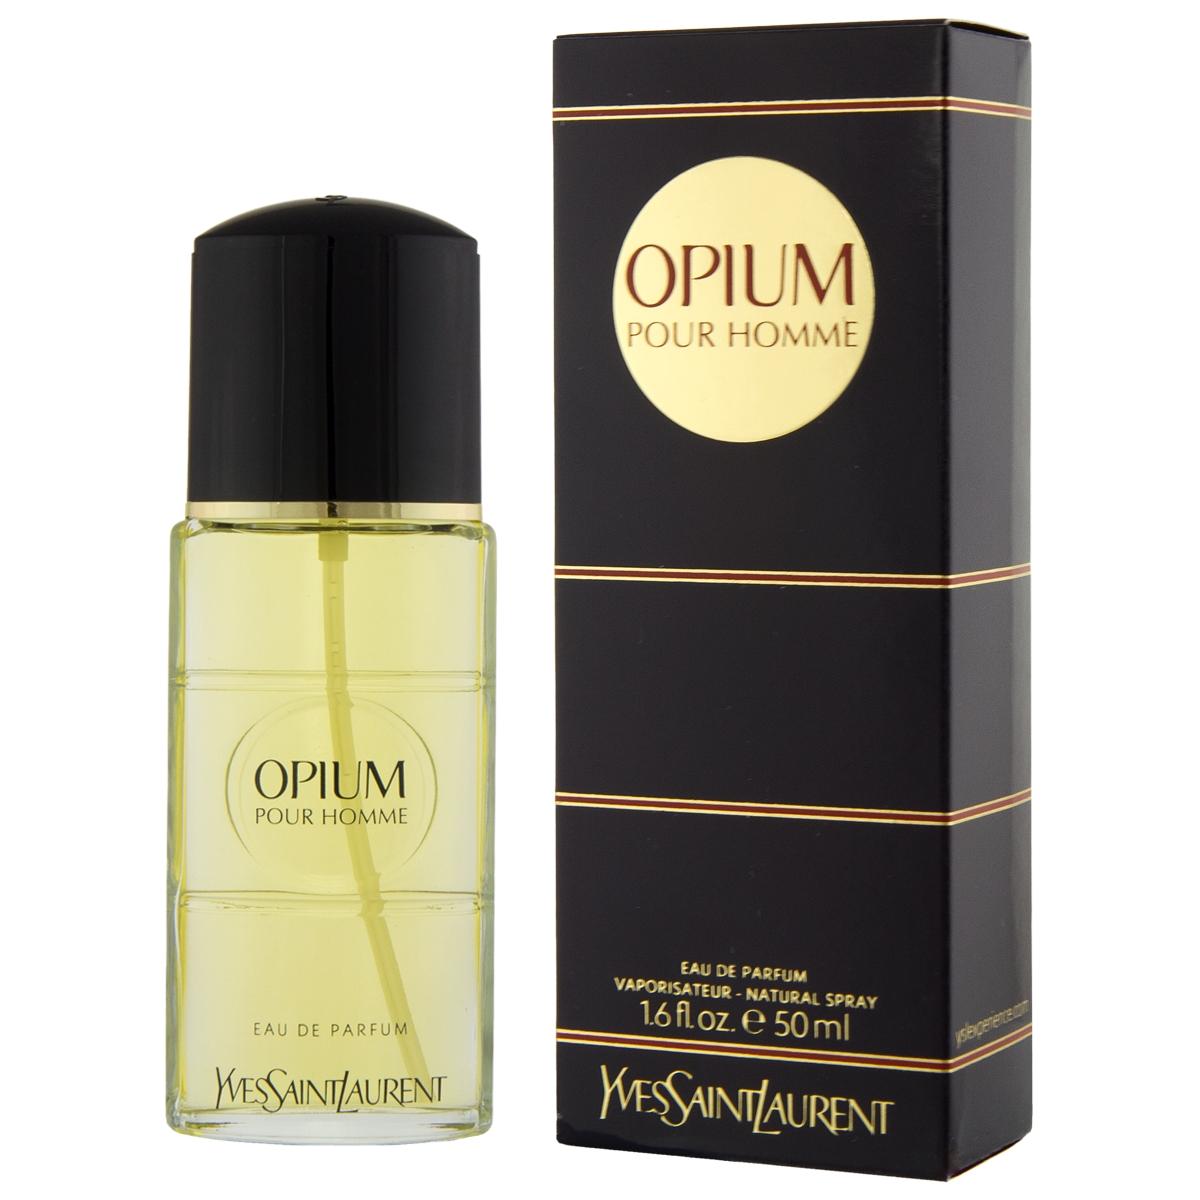 Yves Saint Laurent Opium Pour Homme EDP 50 ml M